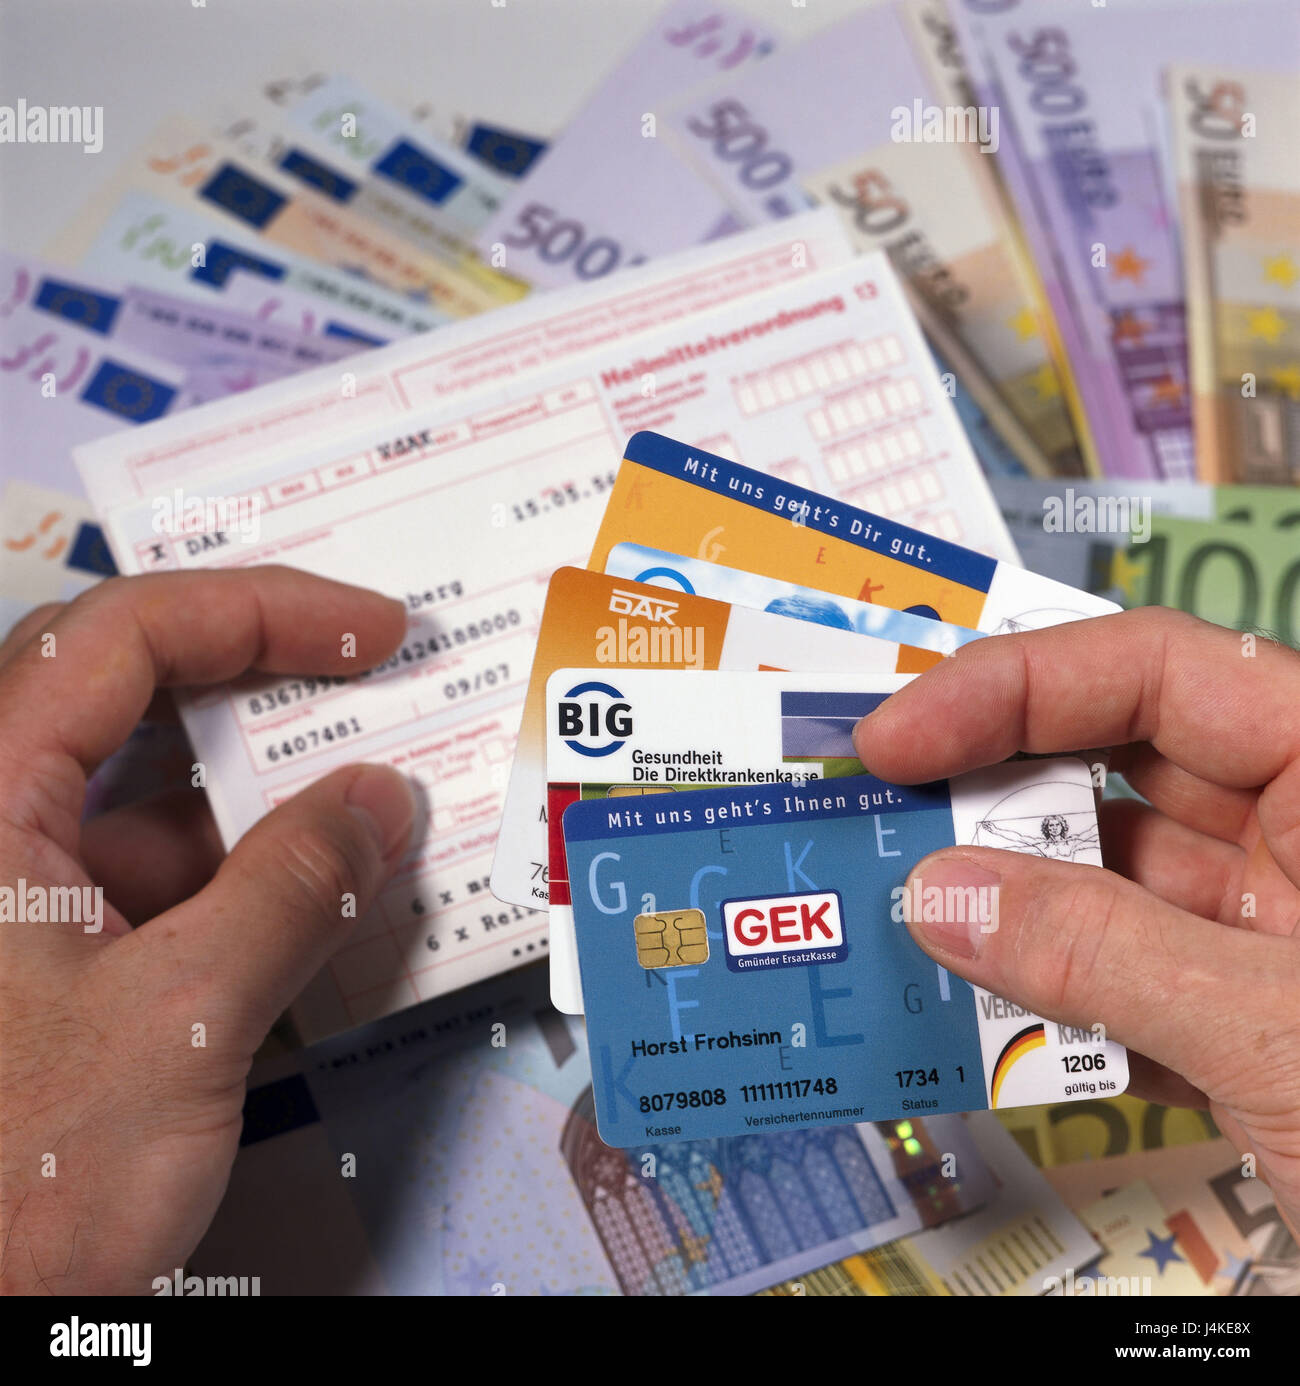 Mann Detail Hande Rezept Licht Versicherungskarten Bank Notizen